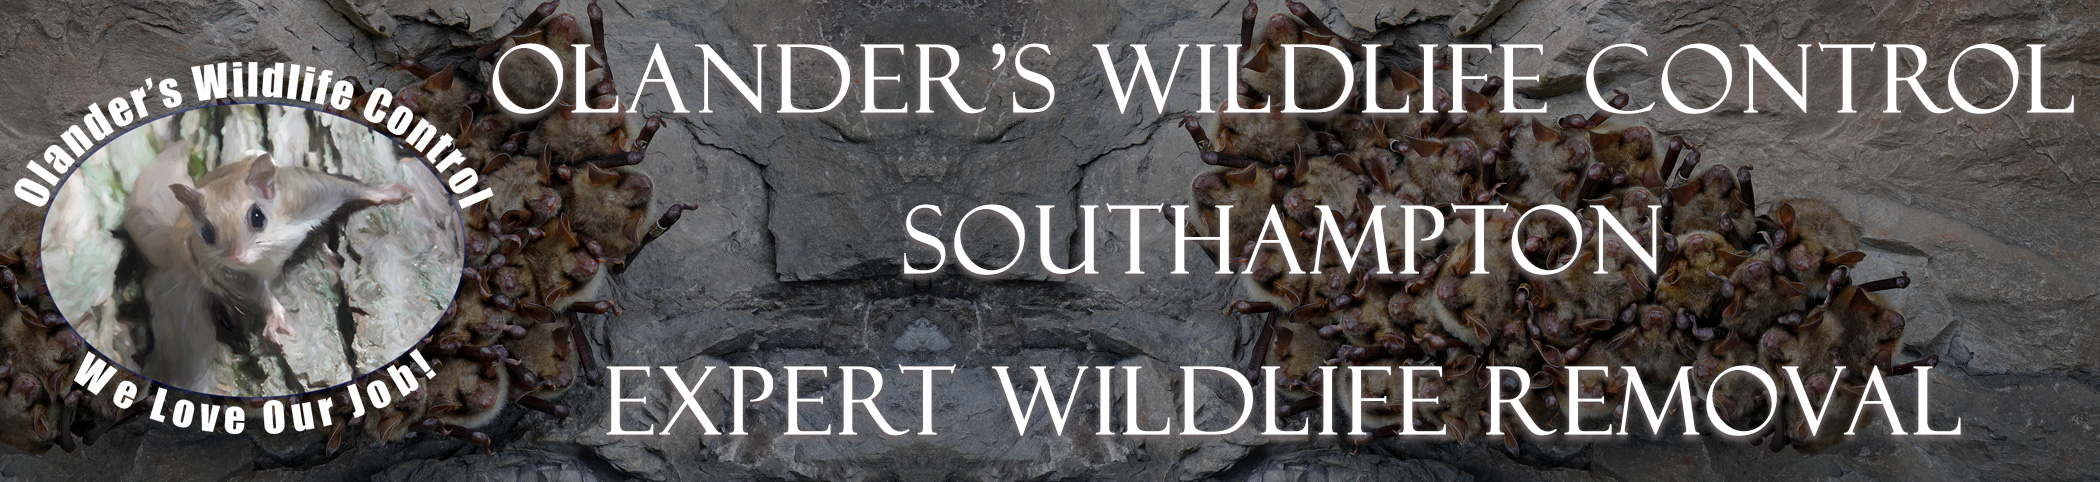 olanders-wildlife-control-southampton-mass-header-image